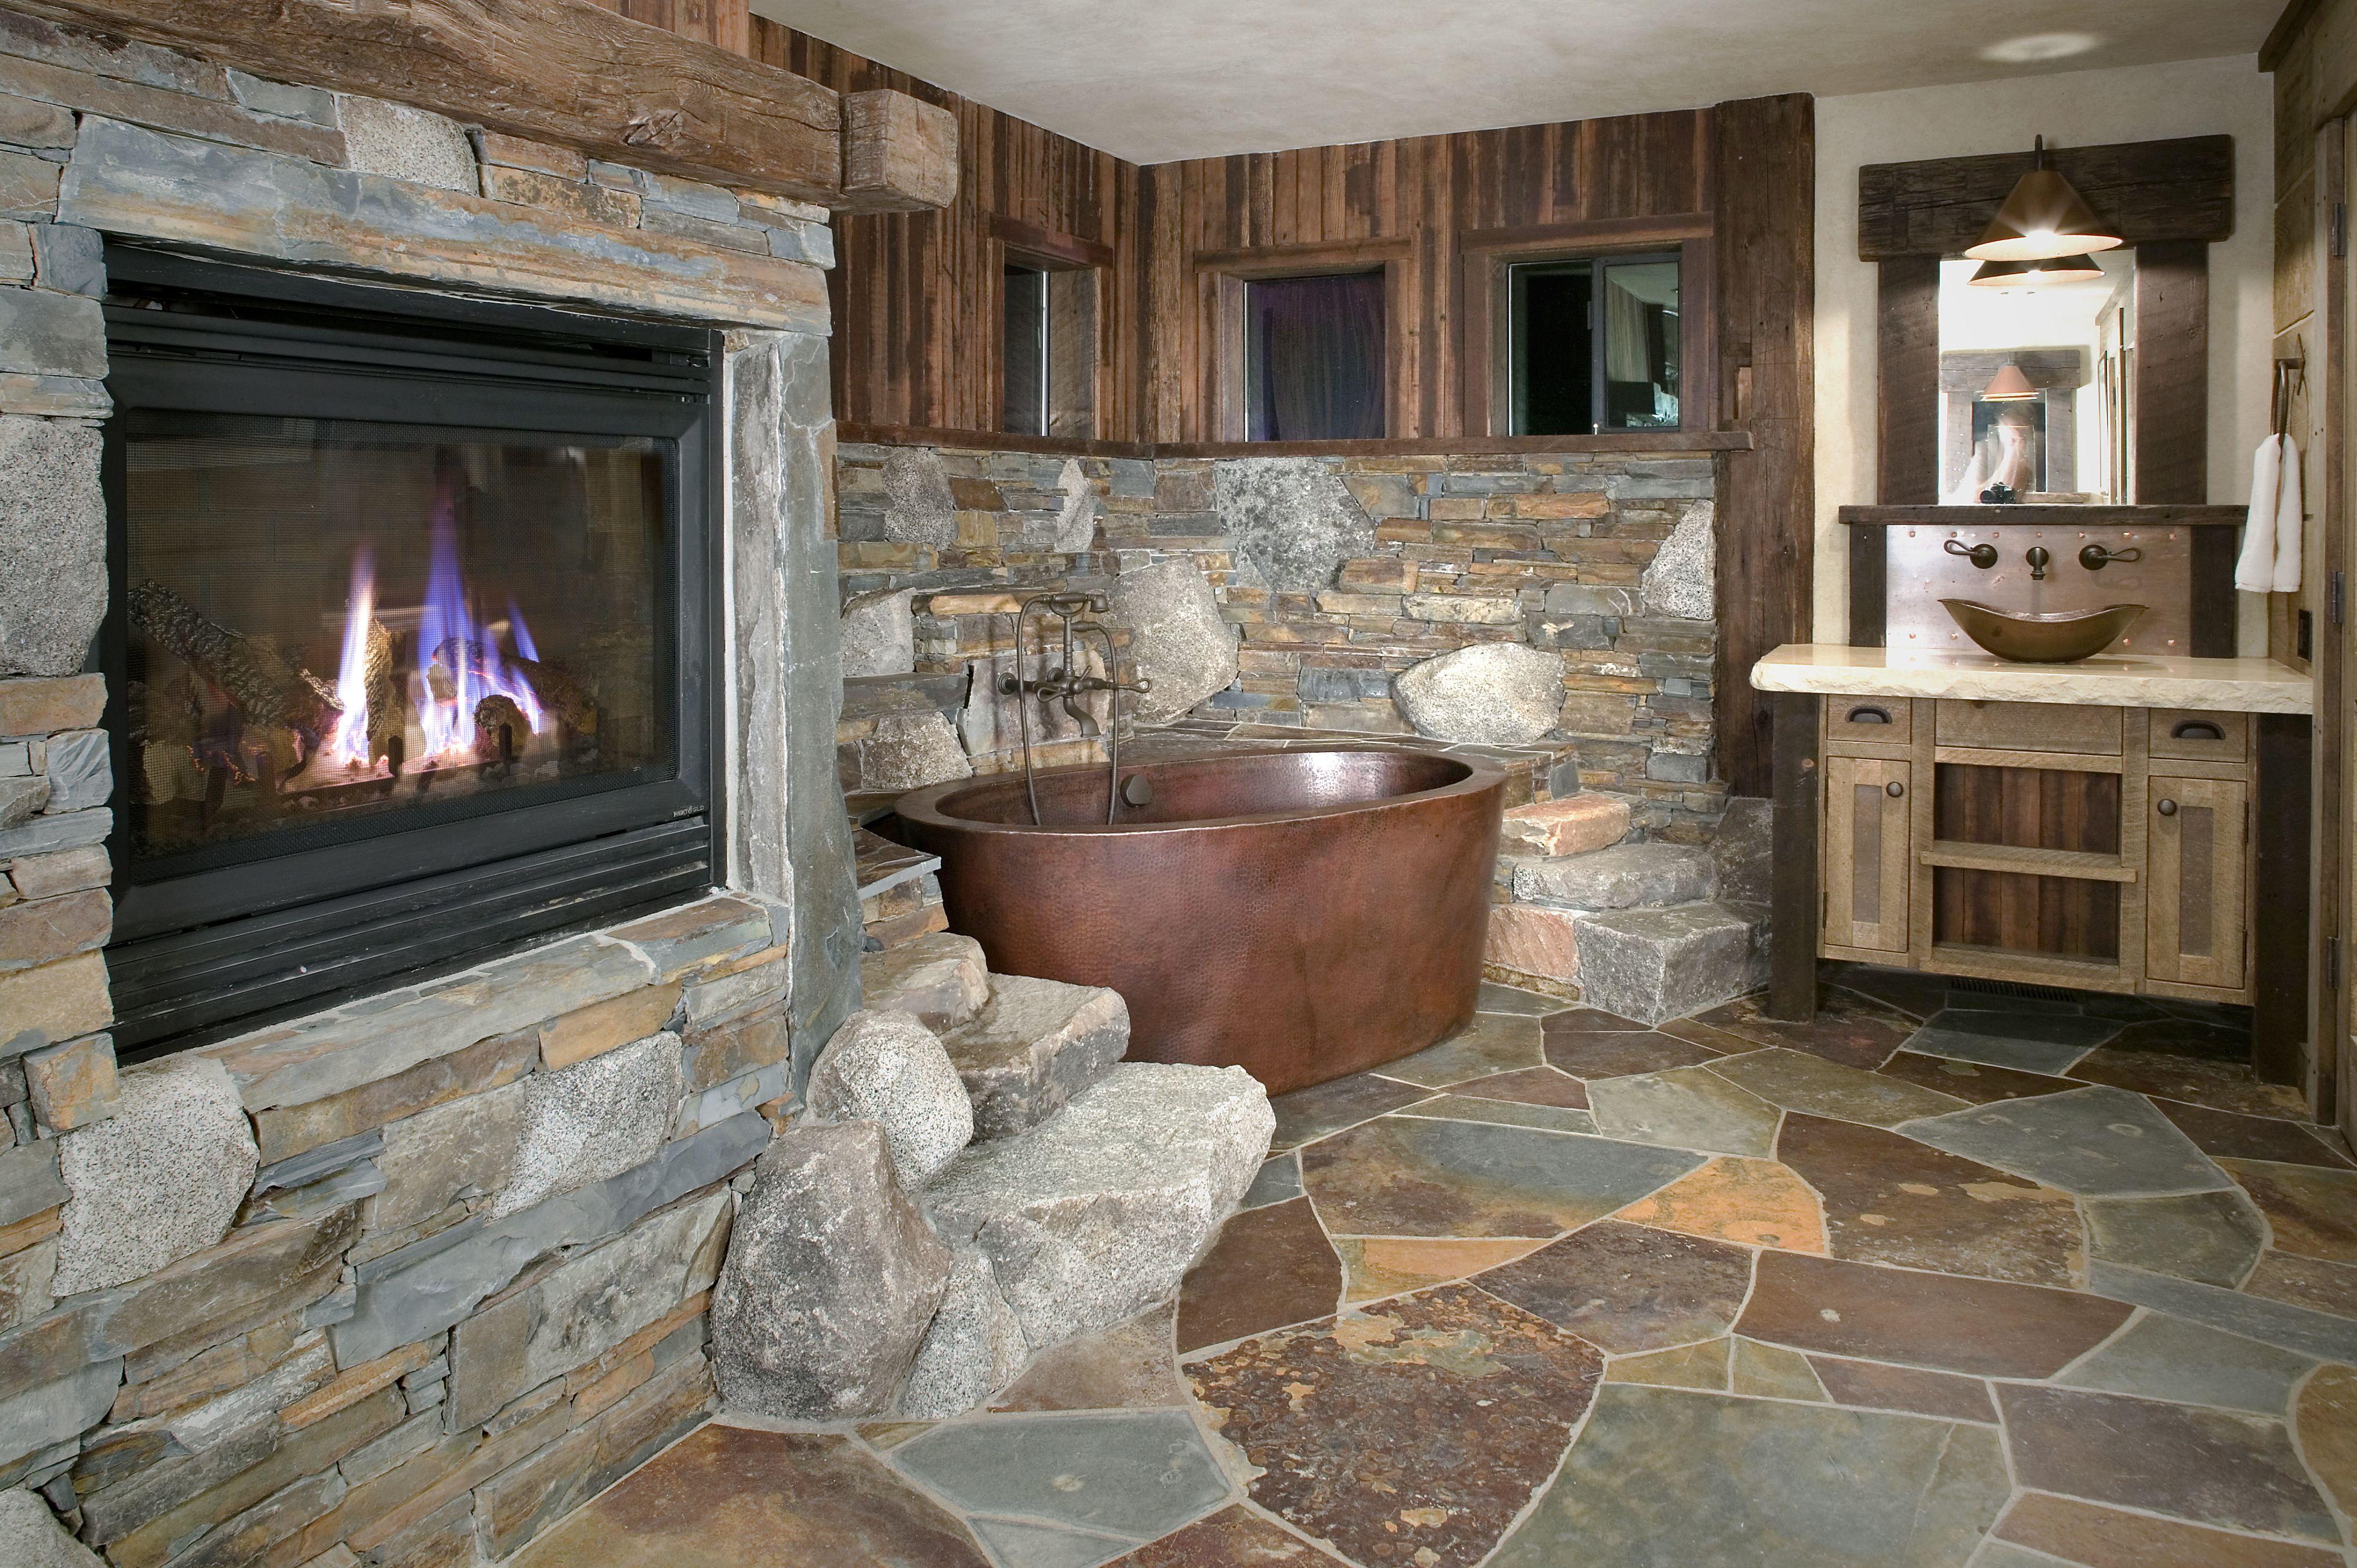 Ski Slope | High Camp Home Interior Design | Truckee, CA